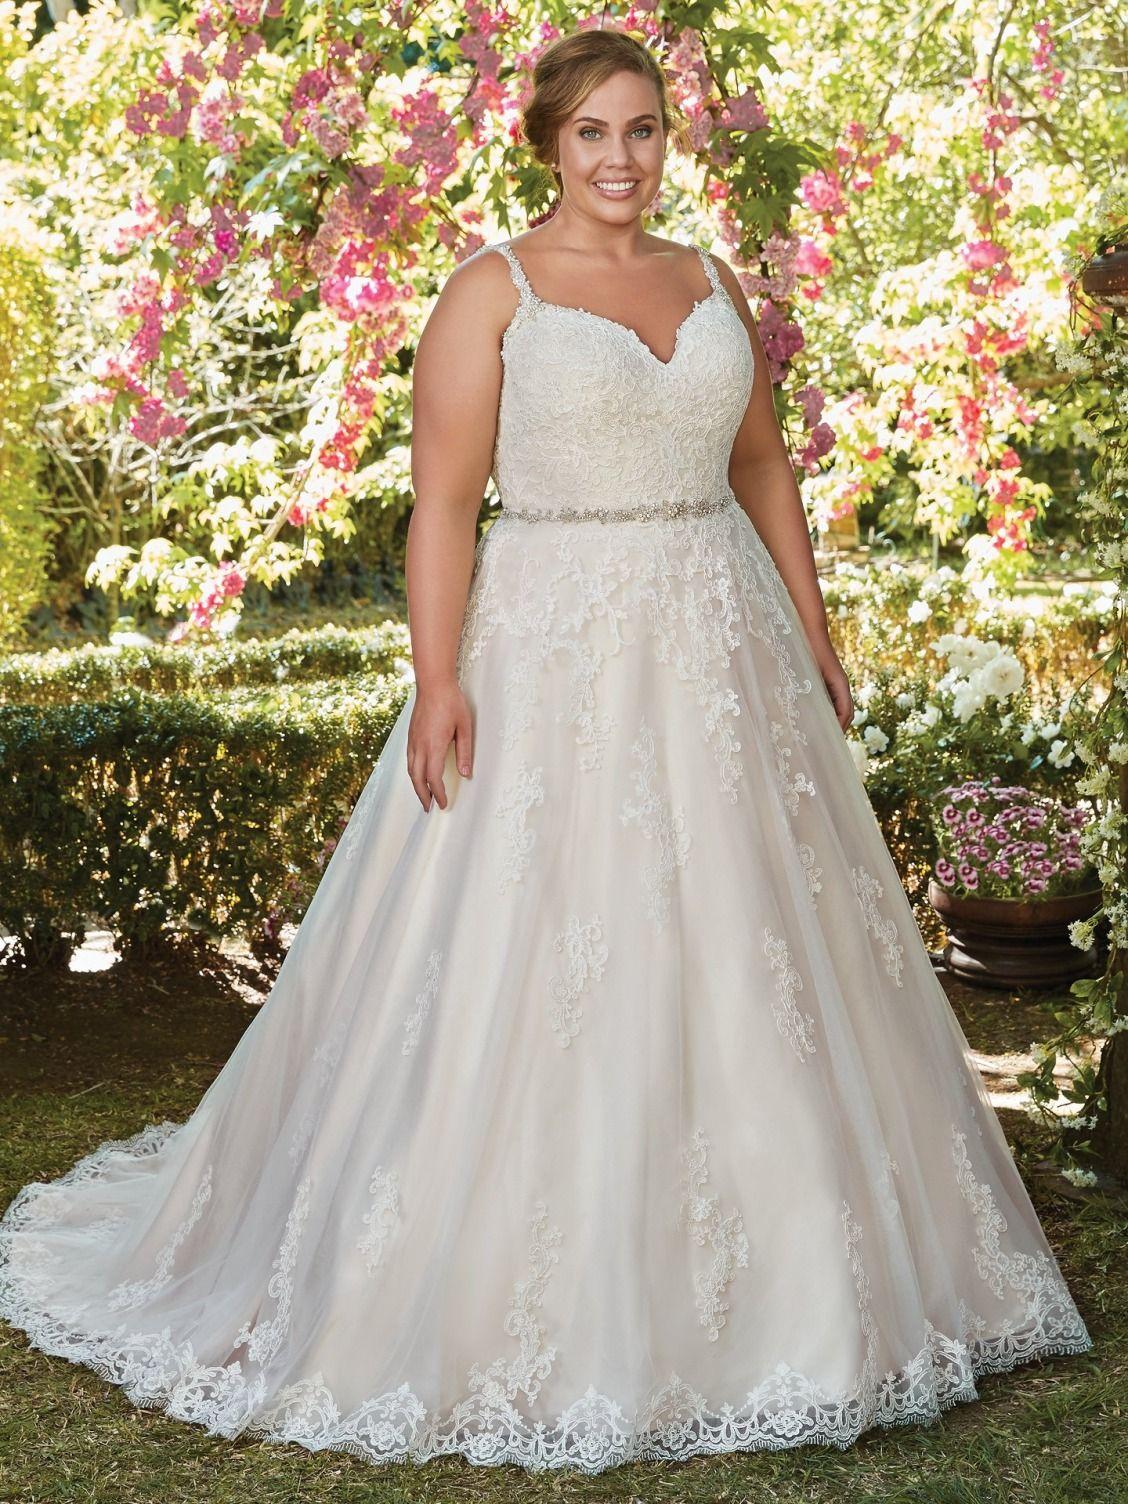 Allison Rebecca Ingram This Gorgeous Ballgown Features A Layer Of Lace Appliques Ov Wedding Dresses Plus Size Wedding Dress Inspiration Fall Wedding Dresses [ 1504 x 1128 Pixel ]